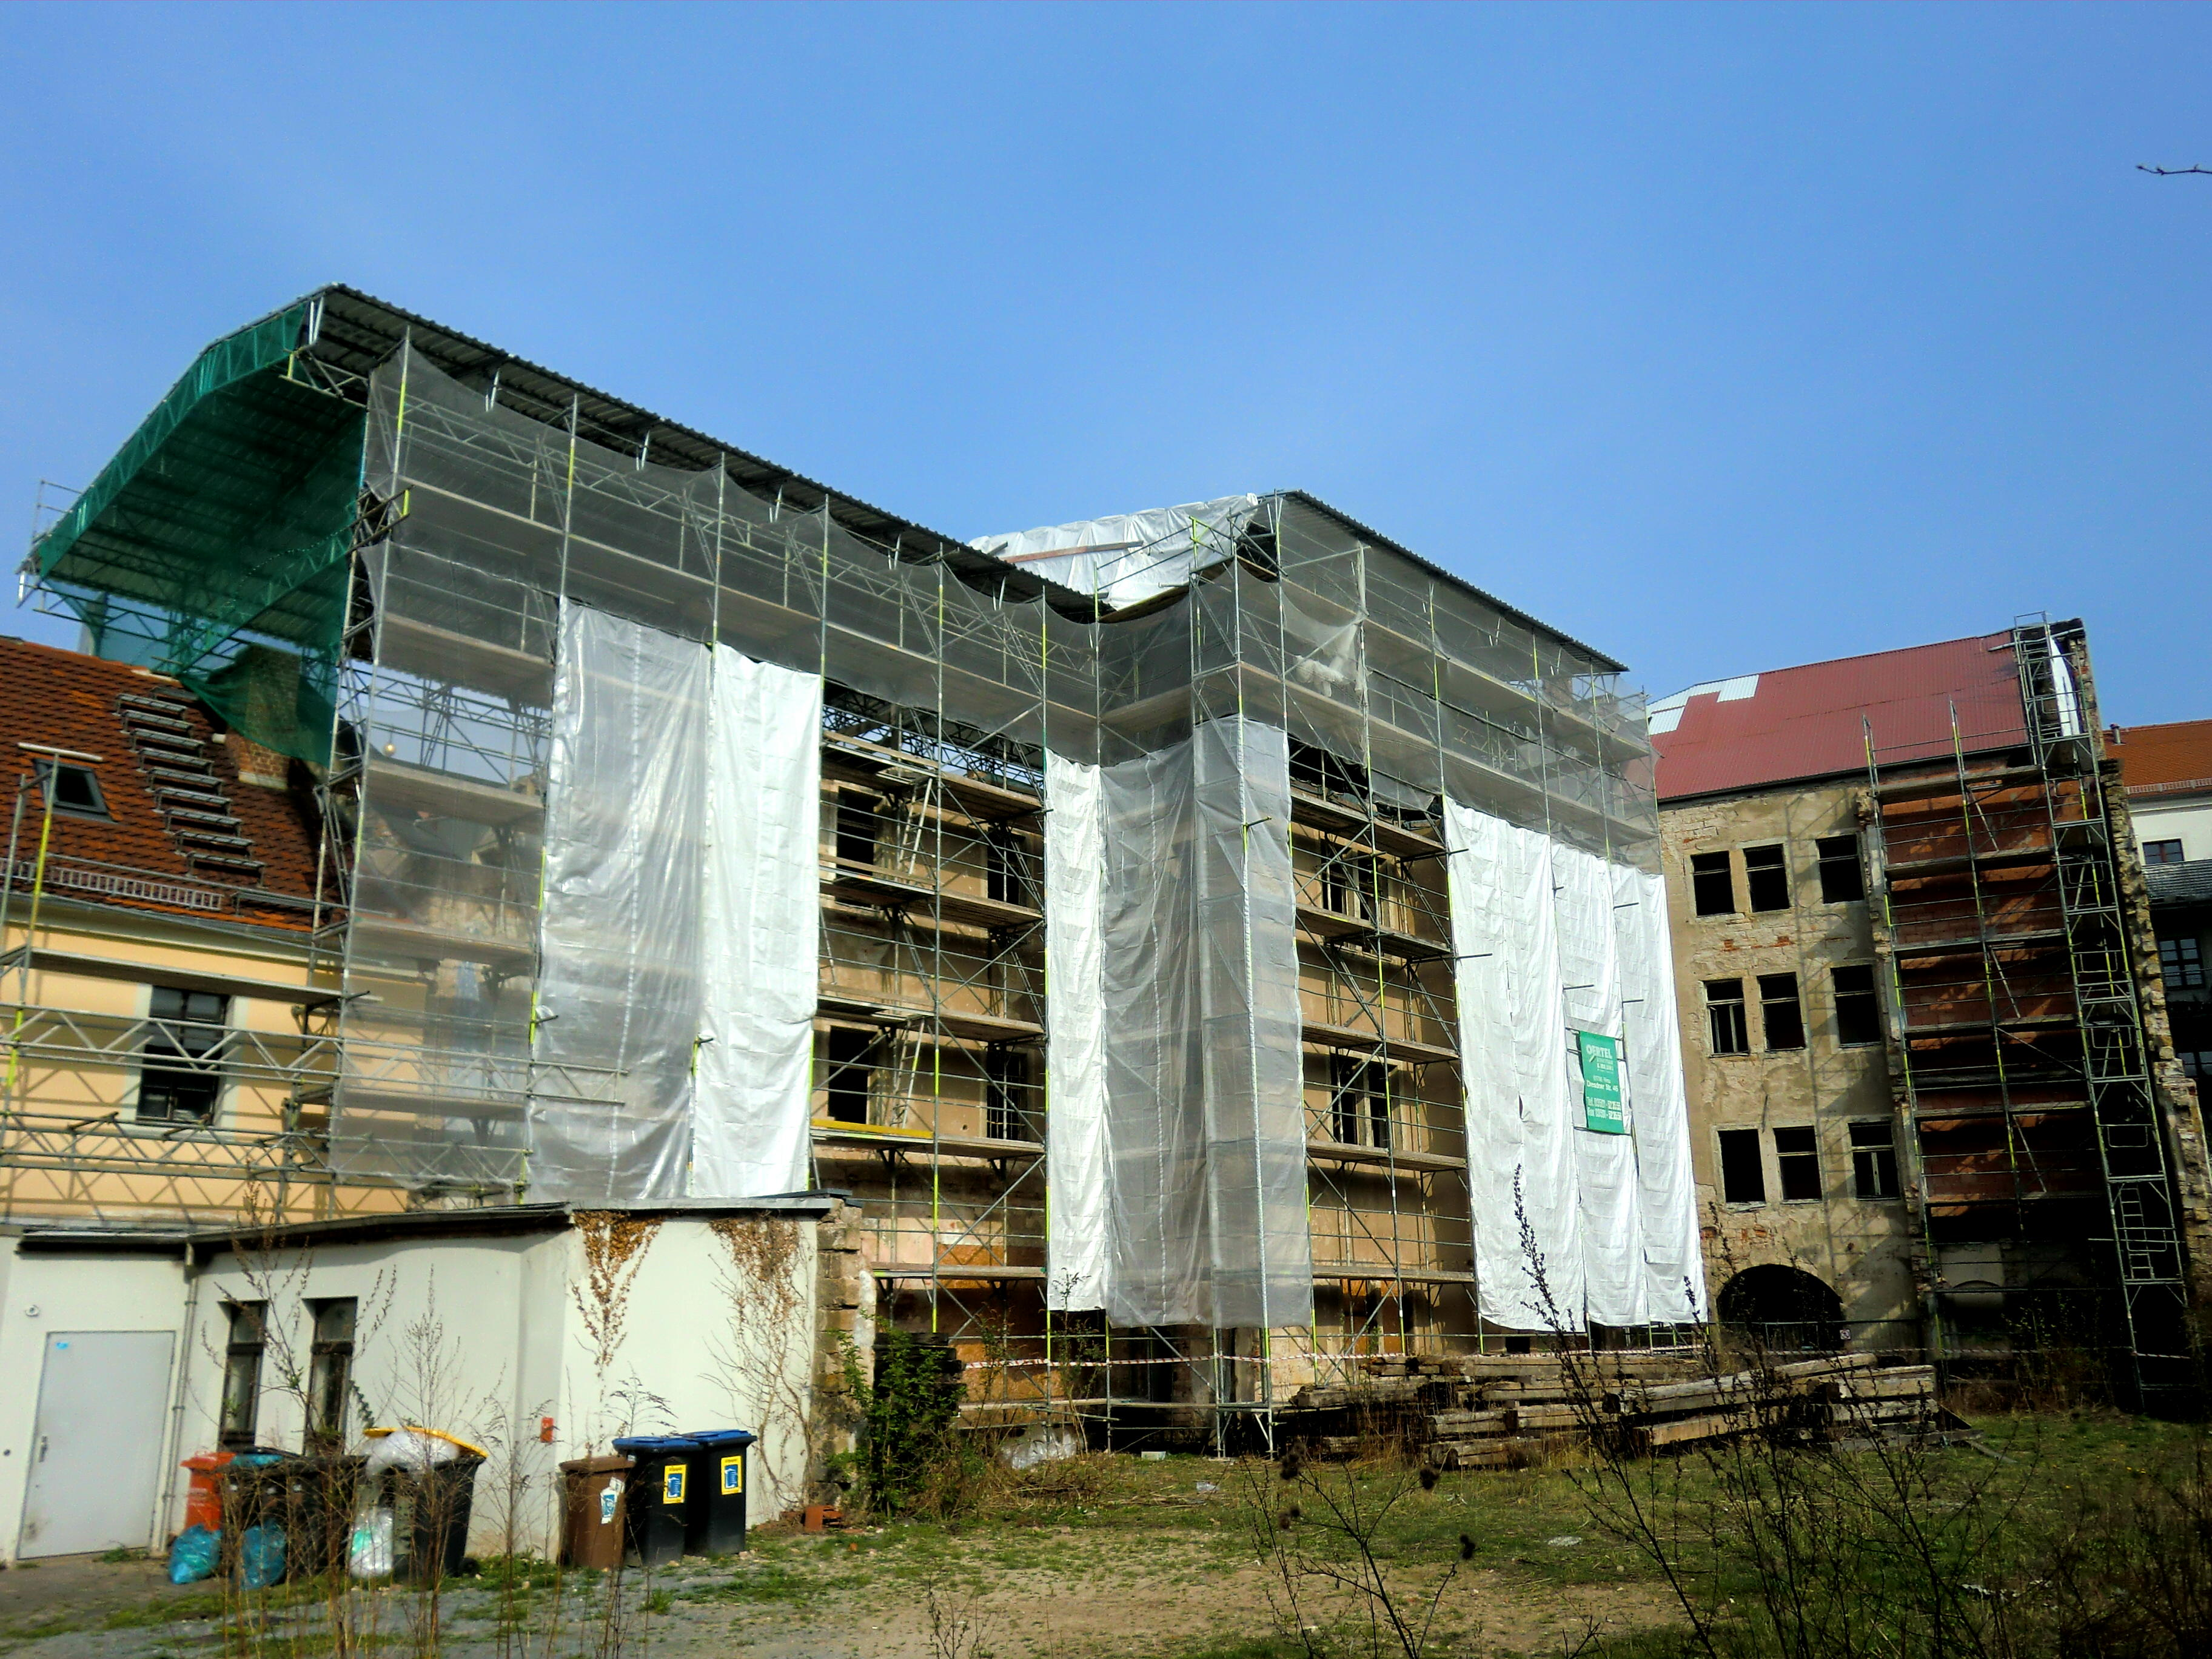 Hostels in Dresden - Top Rated Hostels - Hostelworld